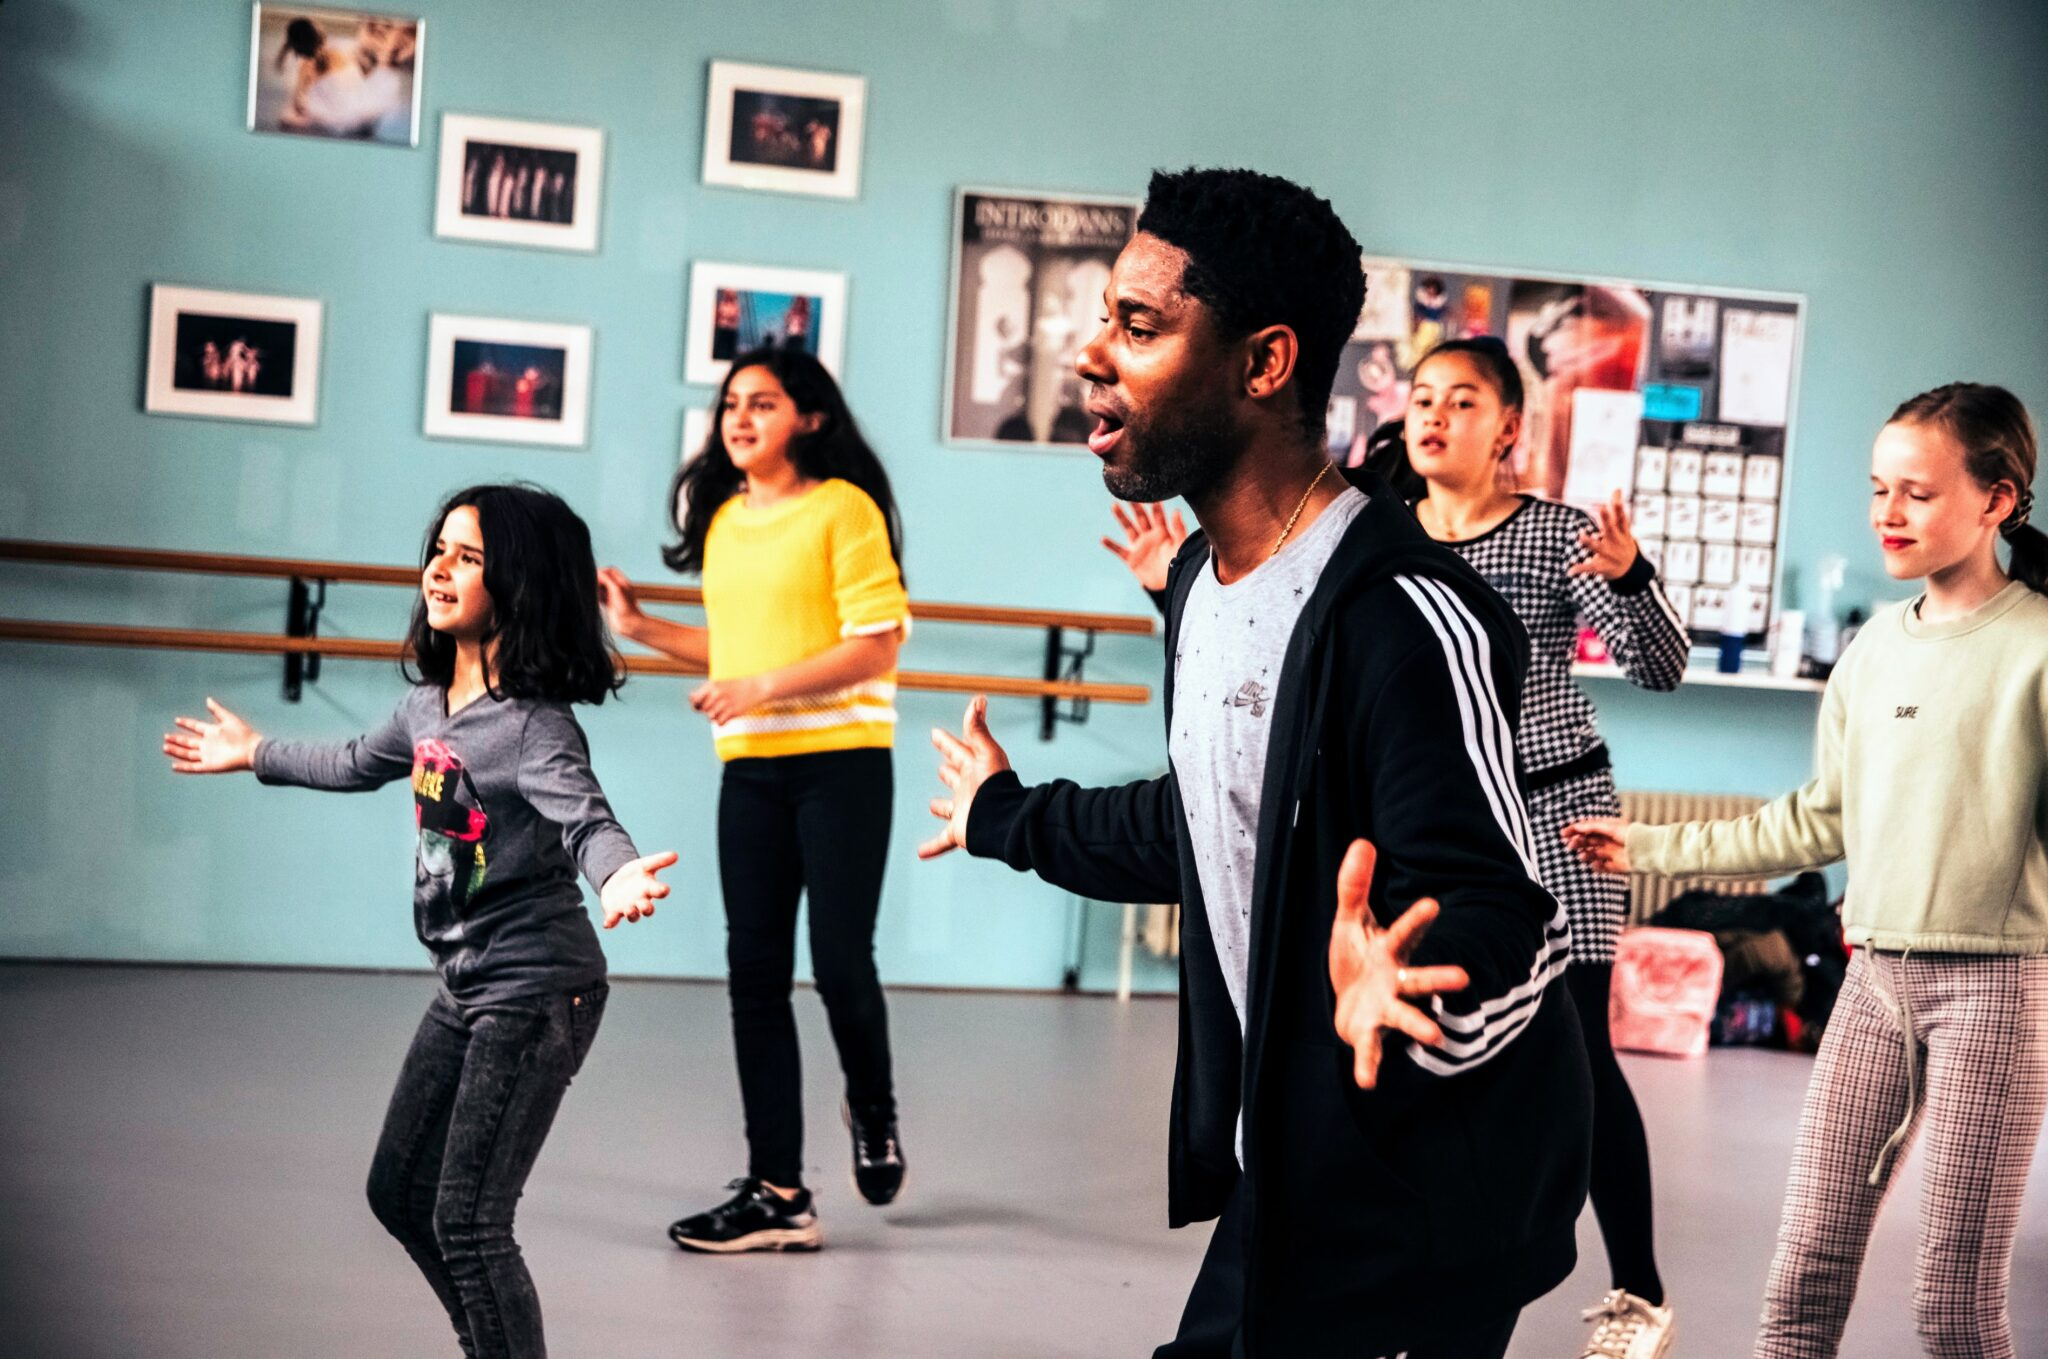 Urvin Monte dansdocent Musicaldance Kaliber